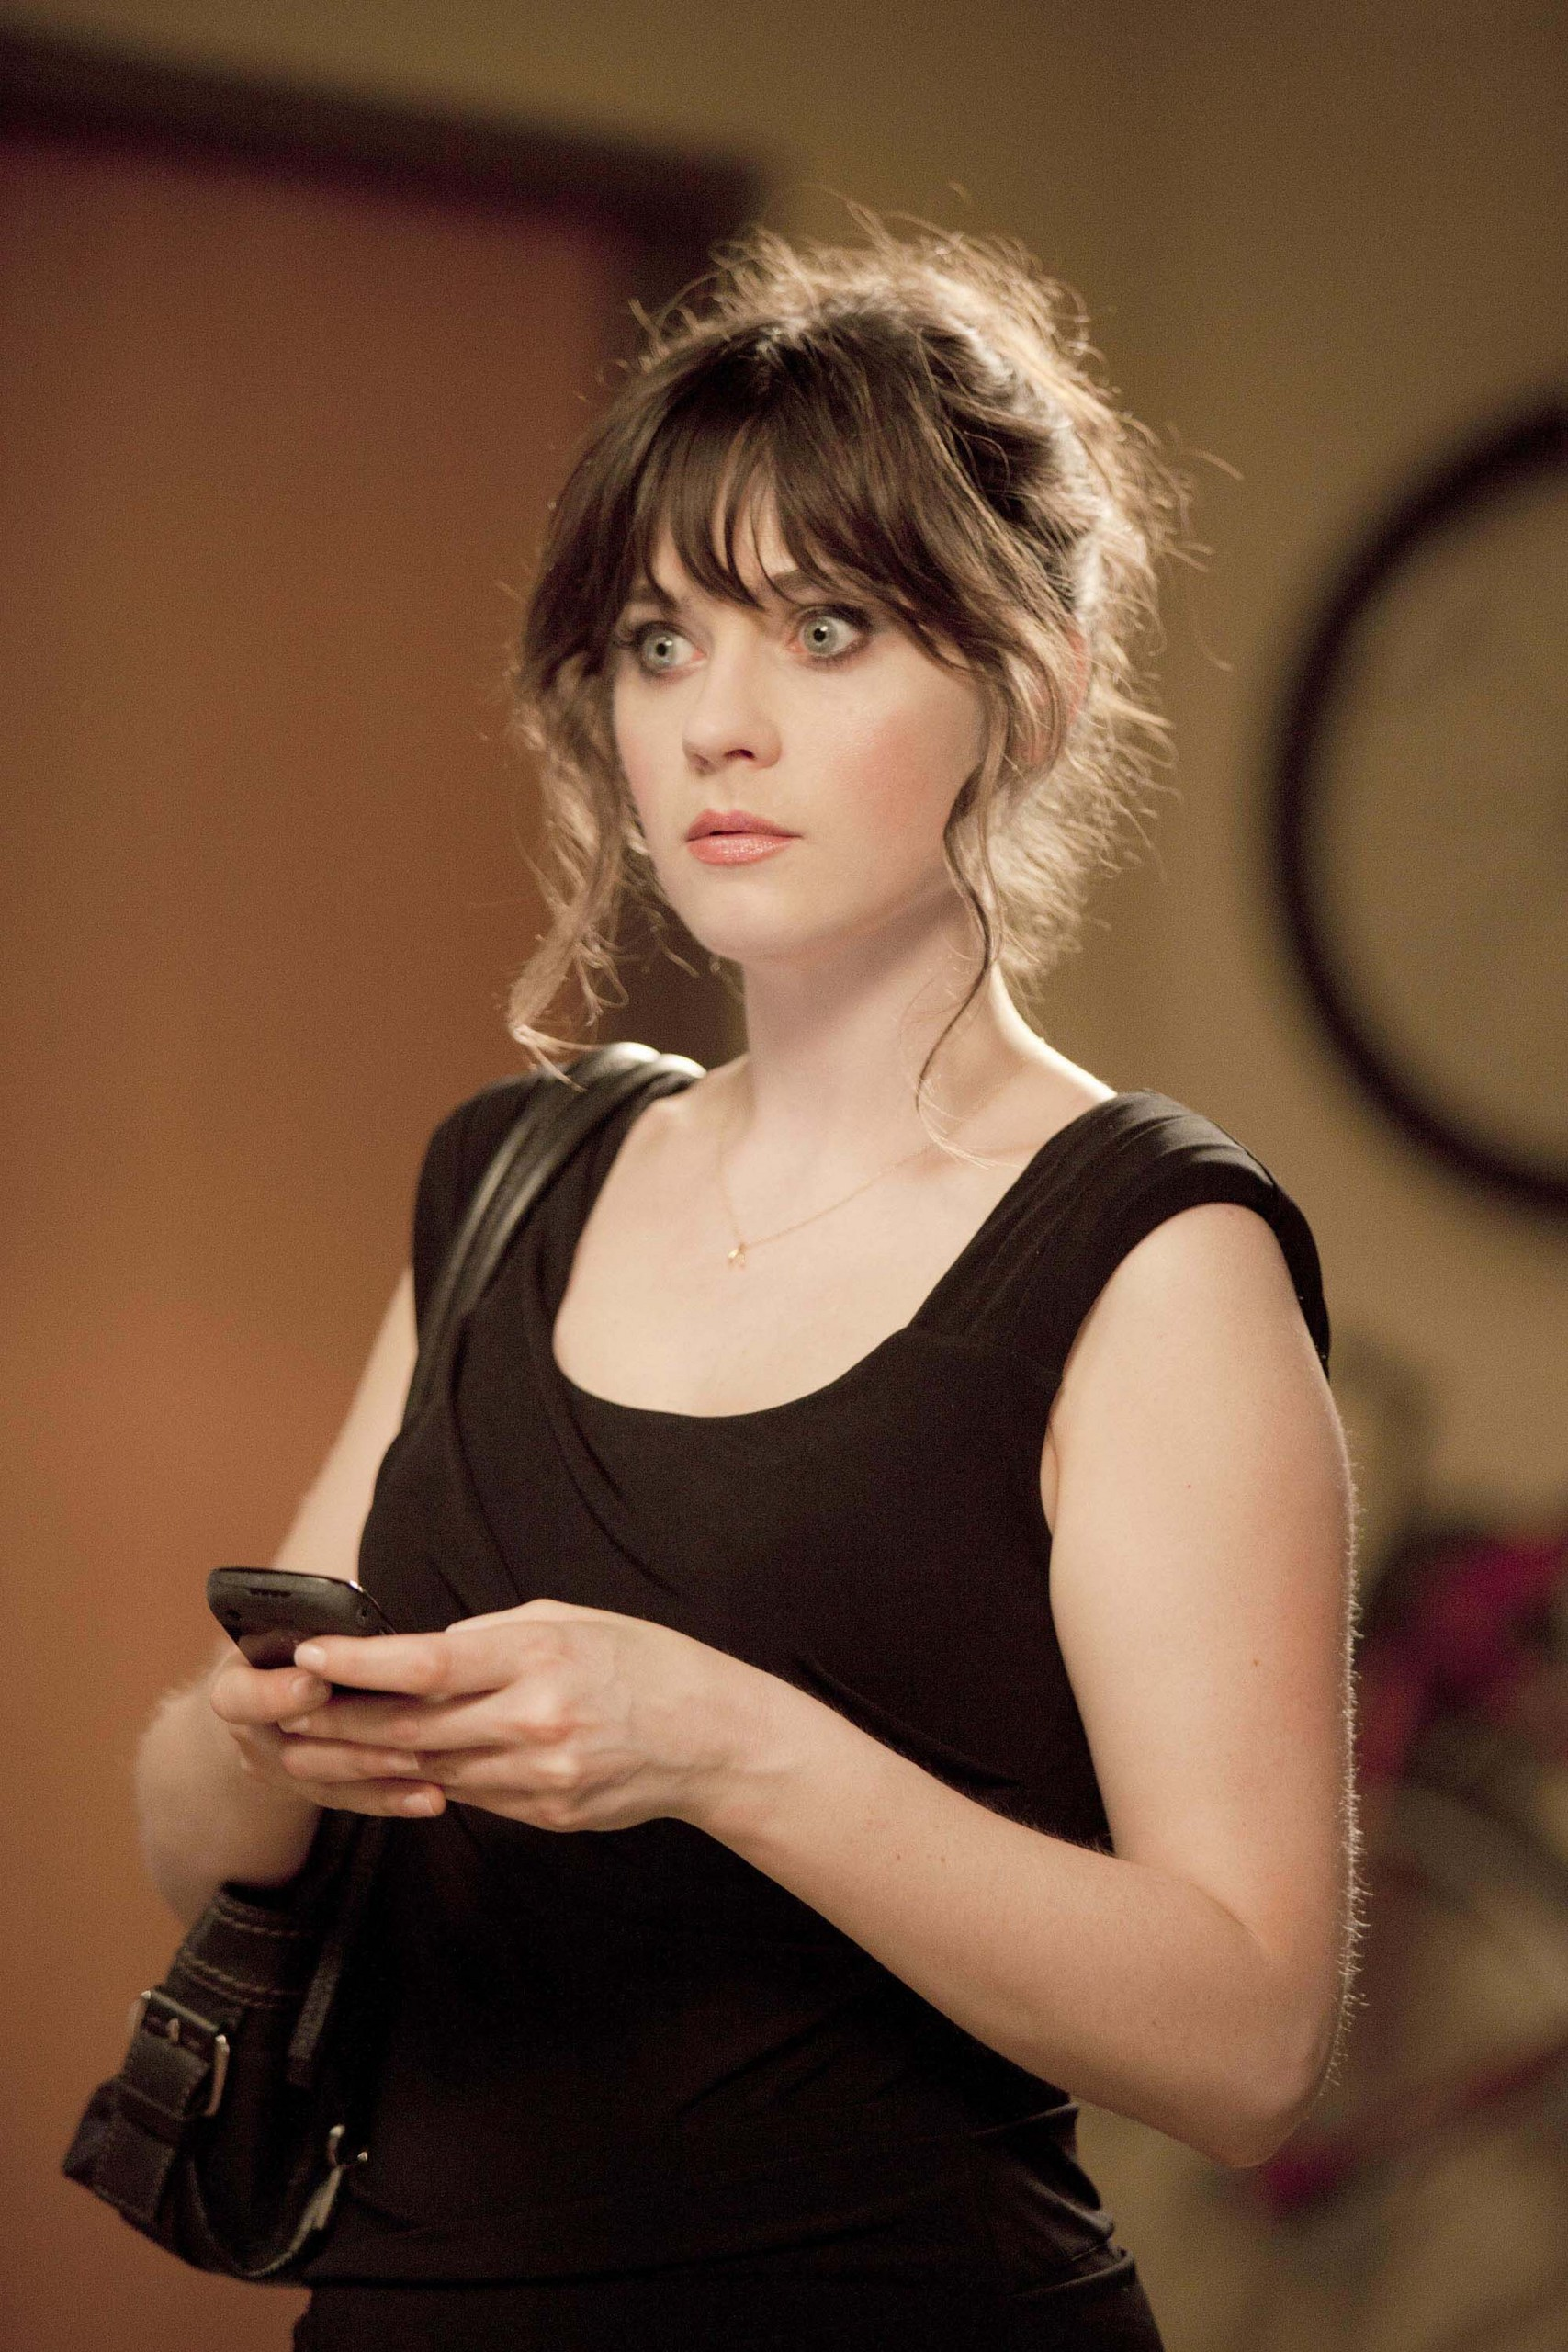 Elisabetta Calleone Zooey-Deschanel-New-Girl-stills-zooey-deschanel-25246930-1707-2560